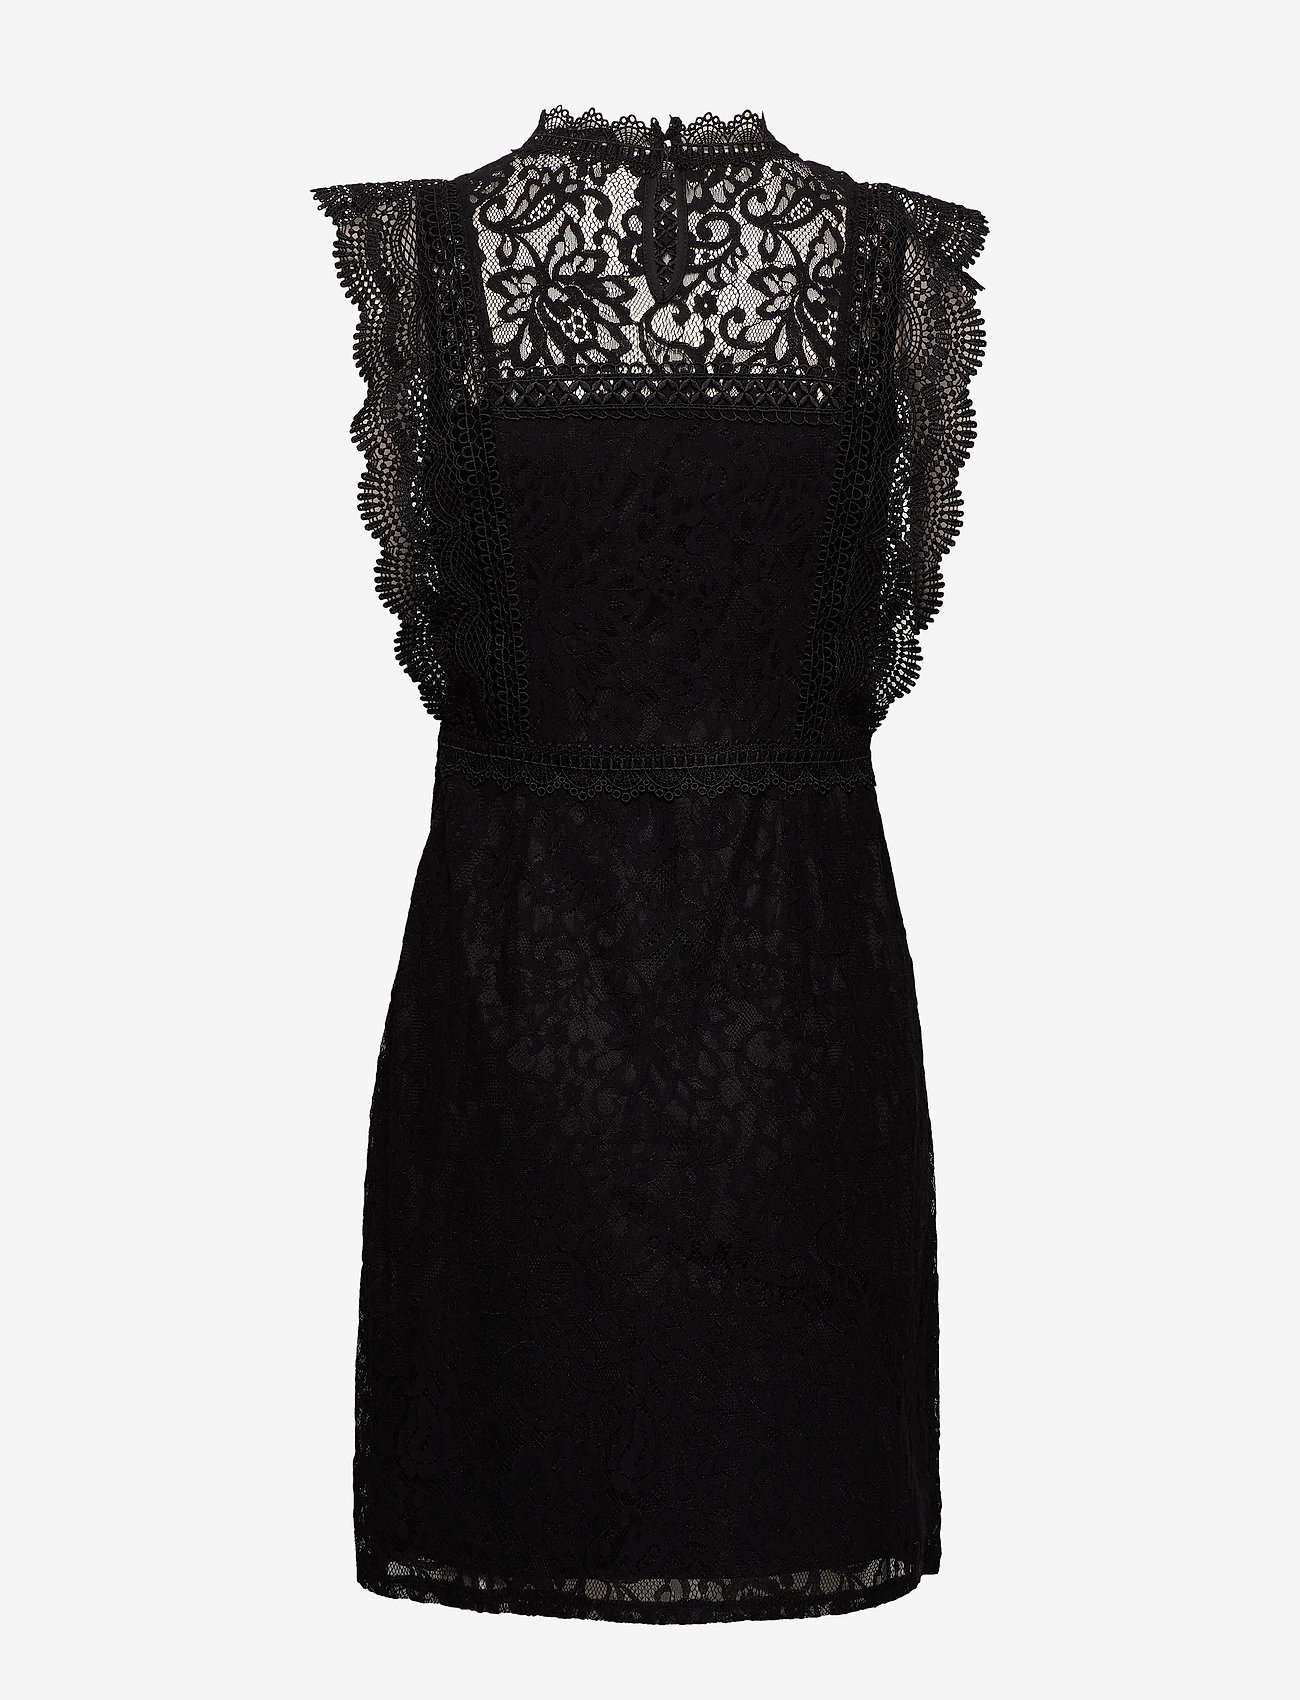 ONLY - ONLKARO S/L LACE ABOVE KNEE DRESS WVN - short dresses - black